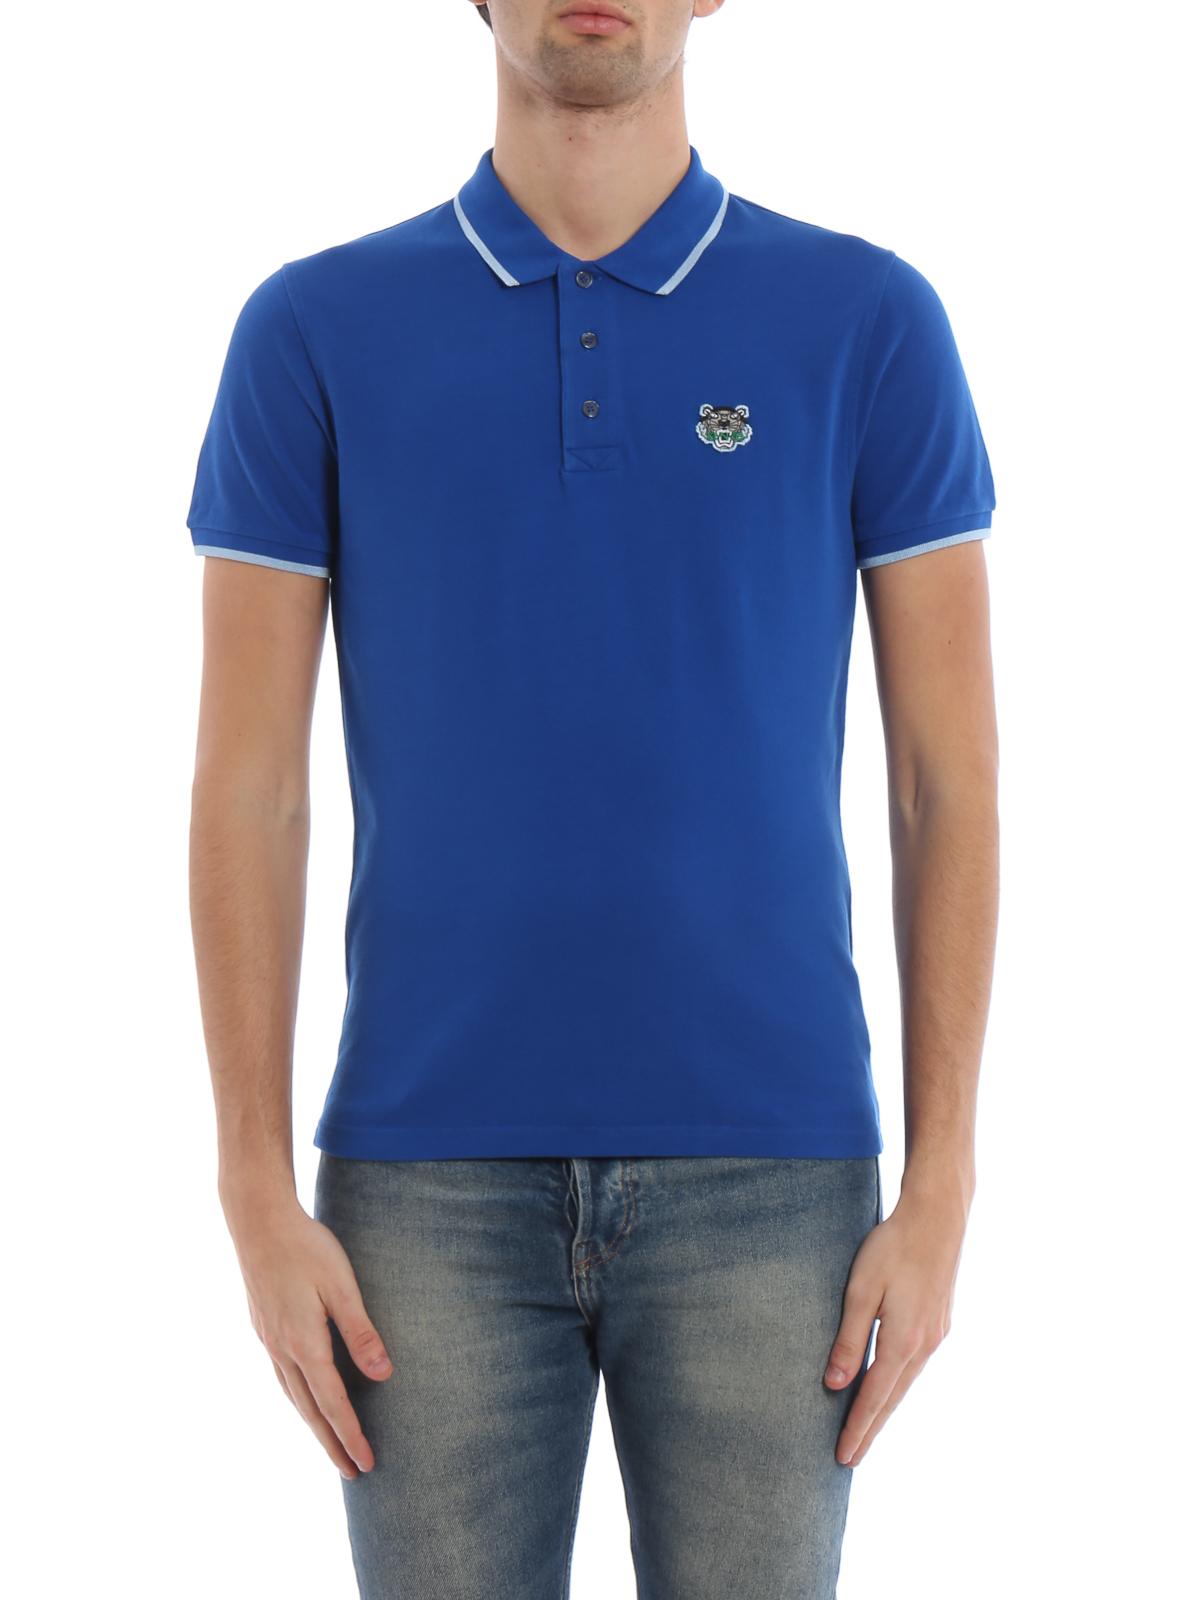 e3a92957 iKRIX KENZO: polo shirts - K Fit Tiger crest blue cotton polo shirt